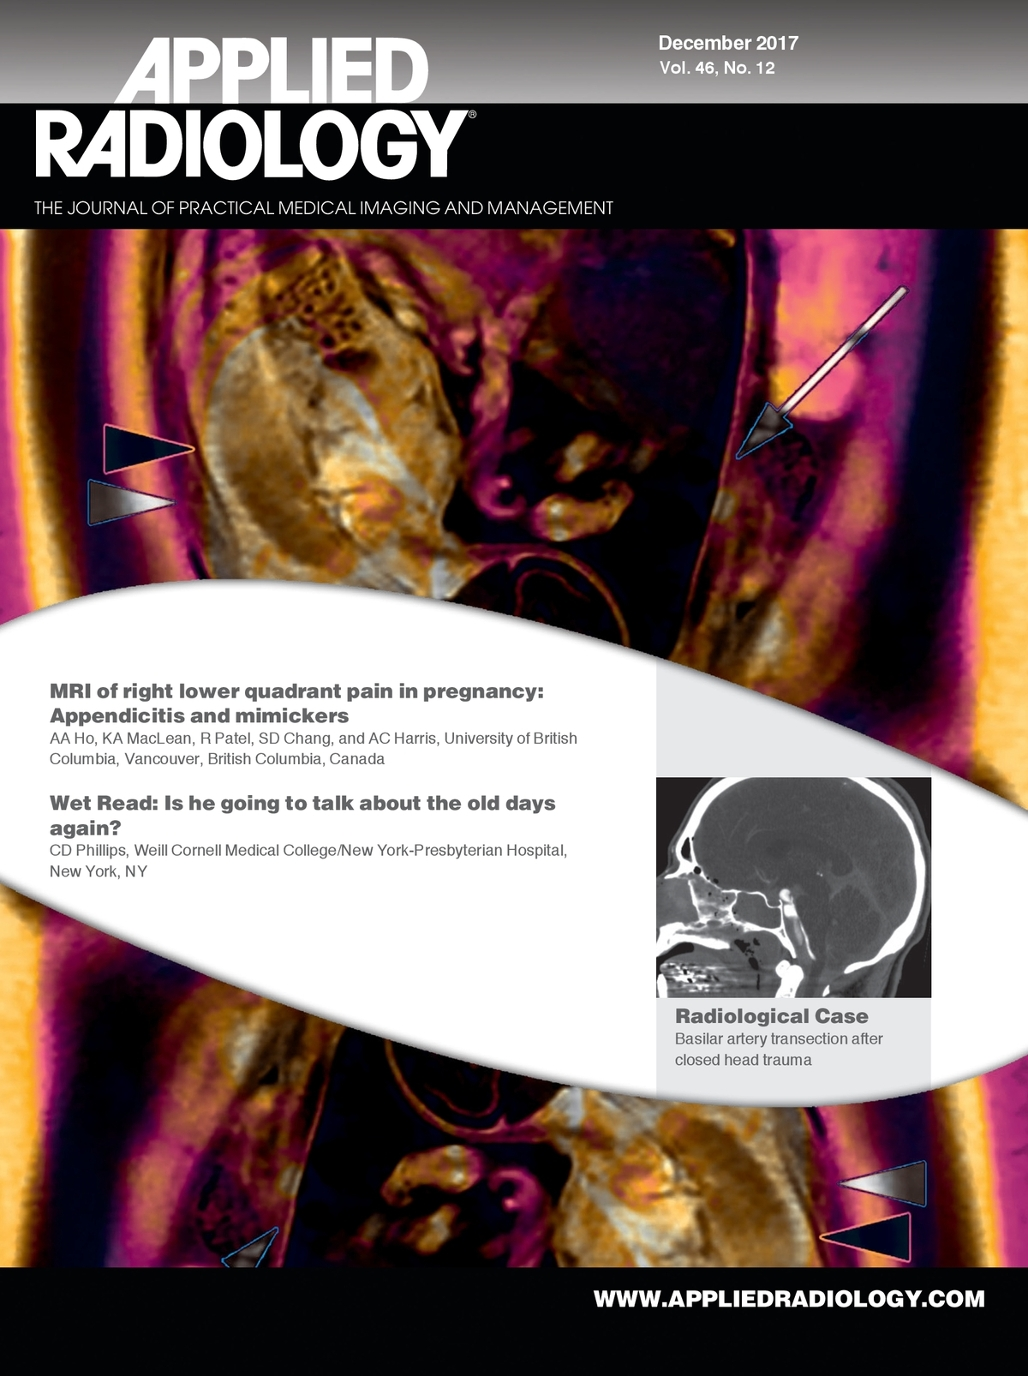 December 2017 Applied Radiology